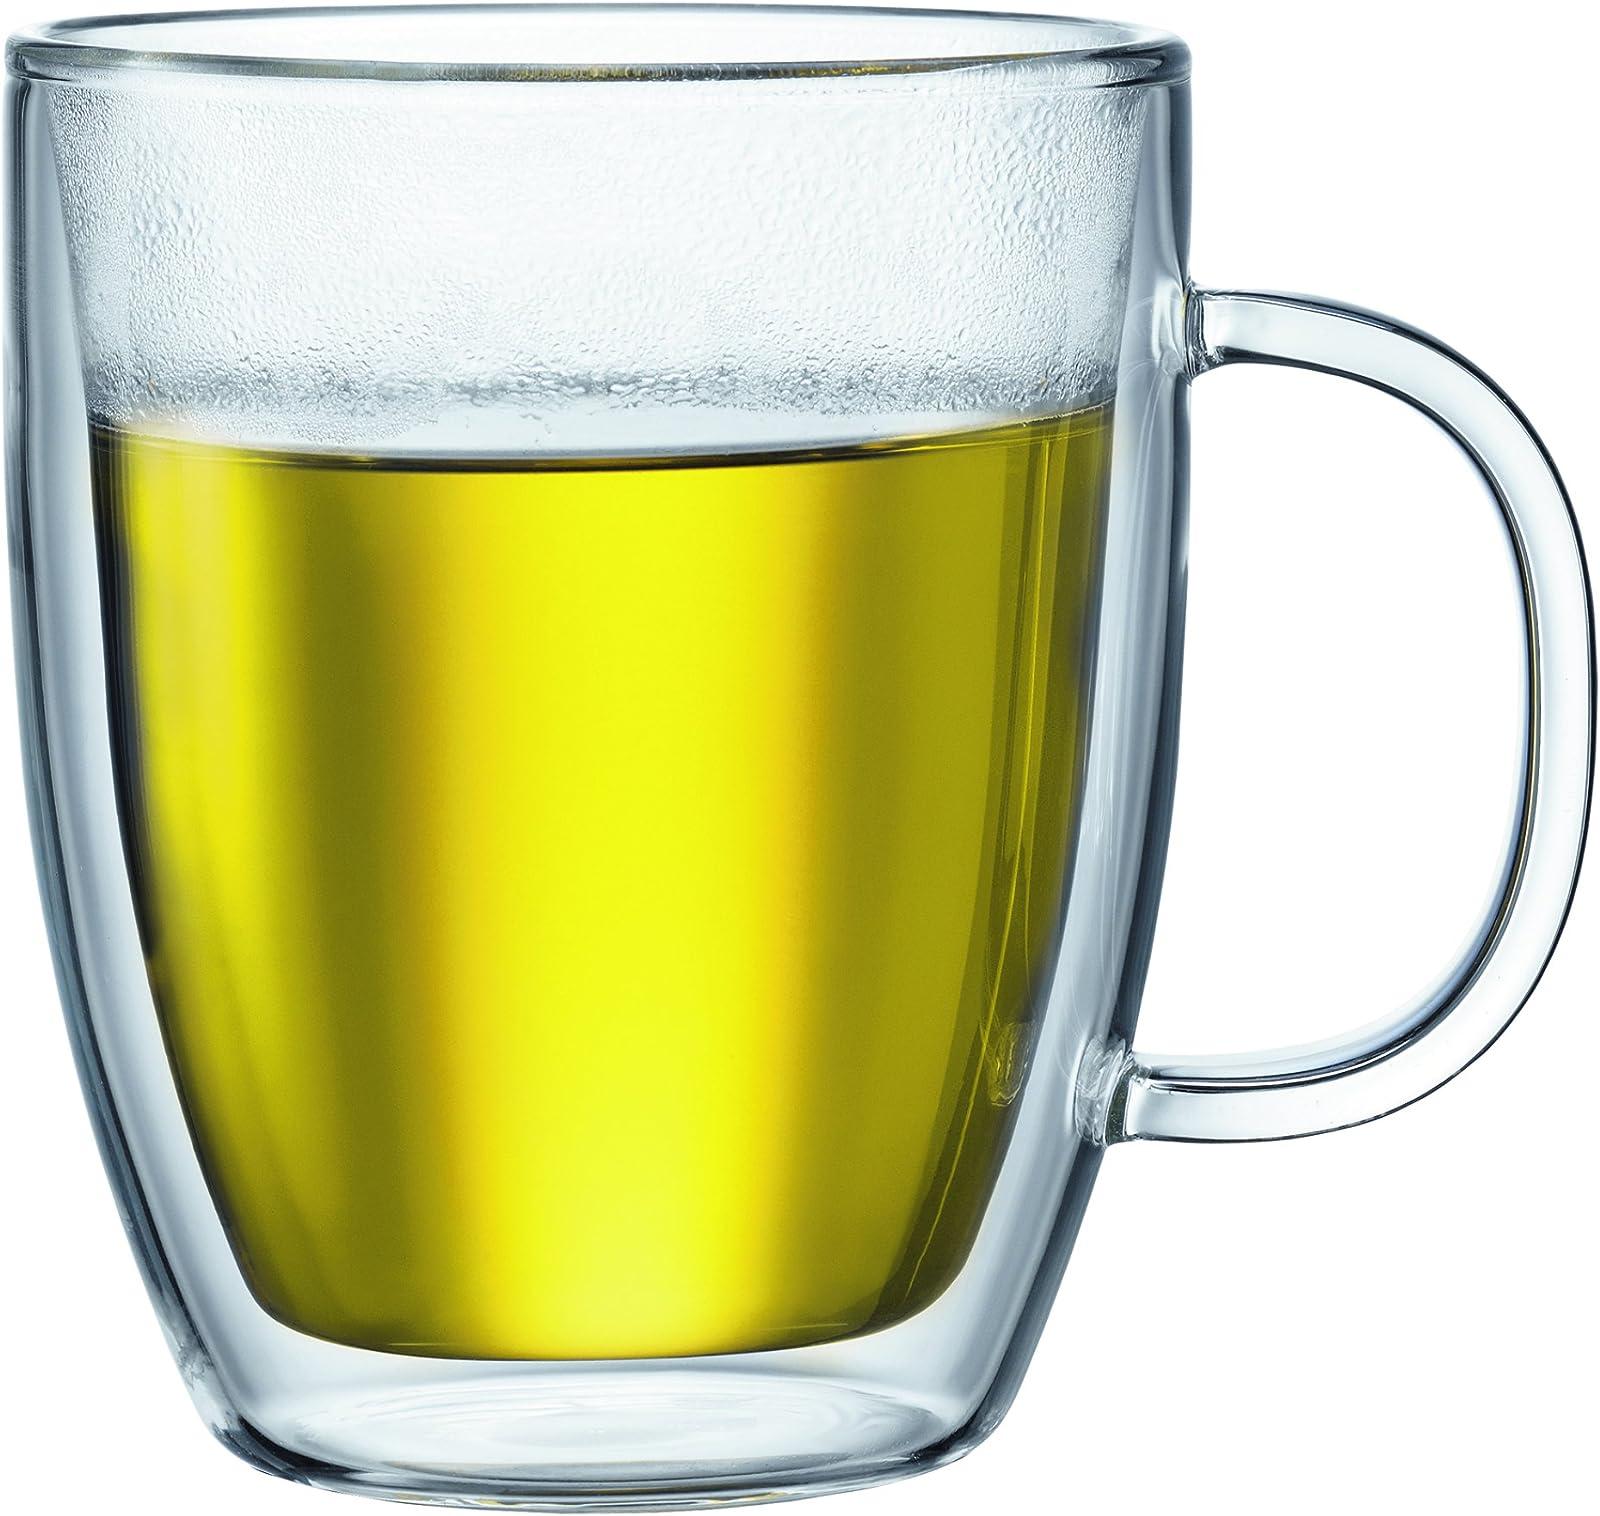 Bodum Glass, Double-Walled Mugs